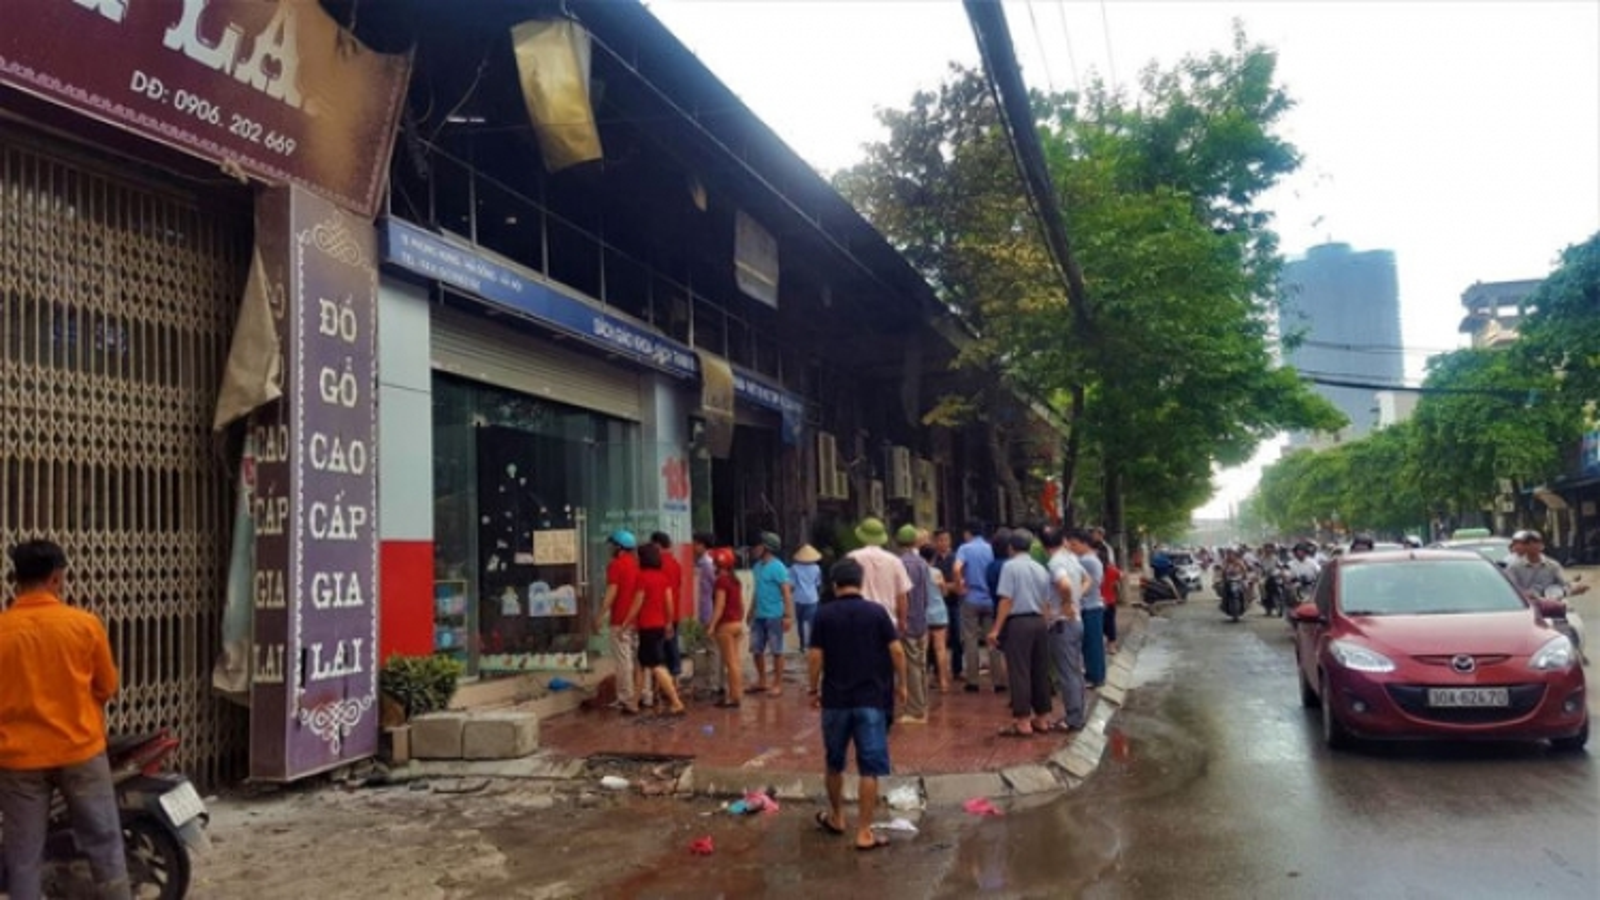 Fire guts bookstore in heart of Hanoi